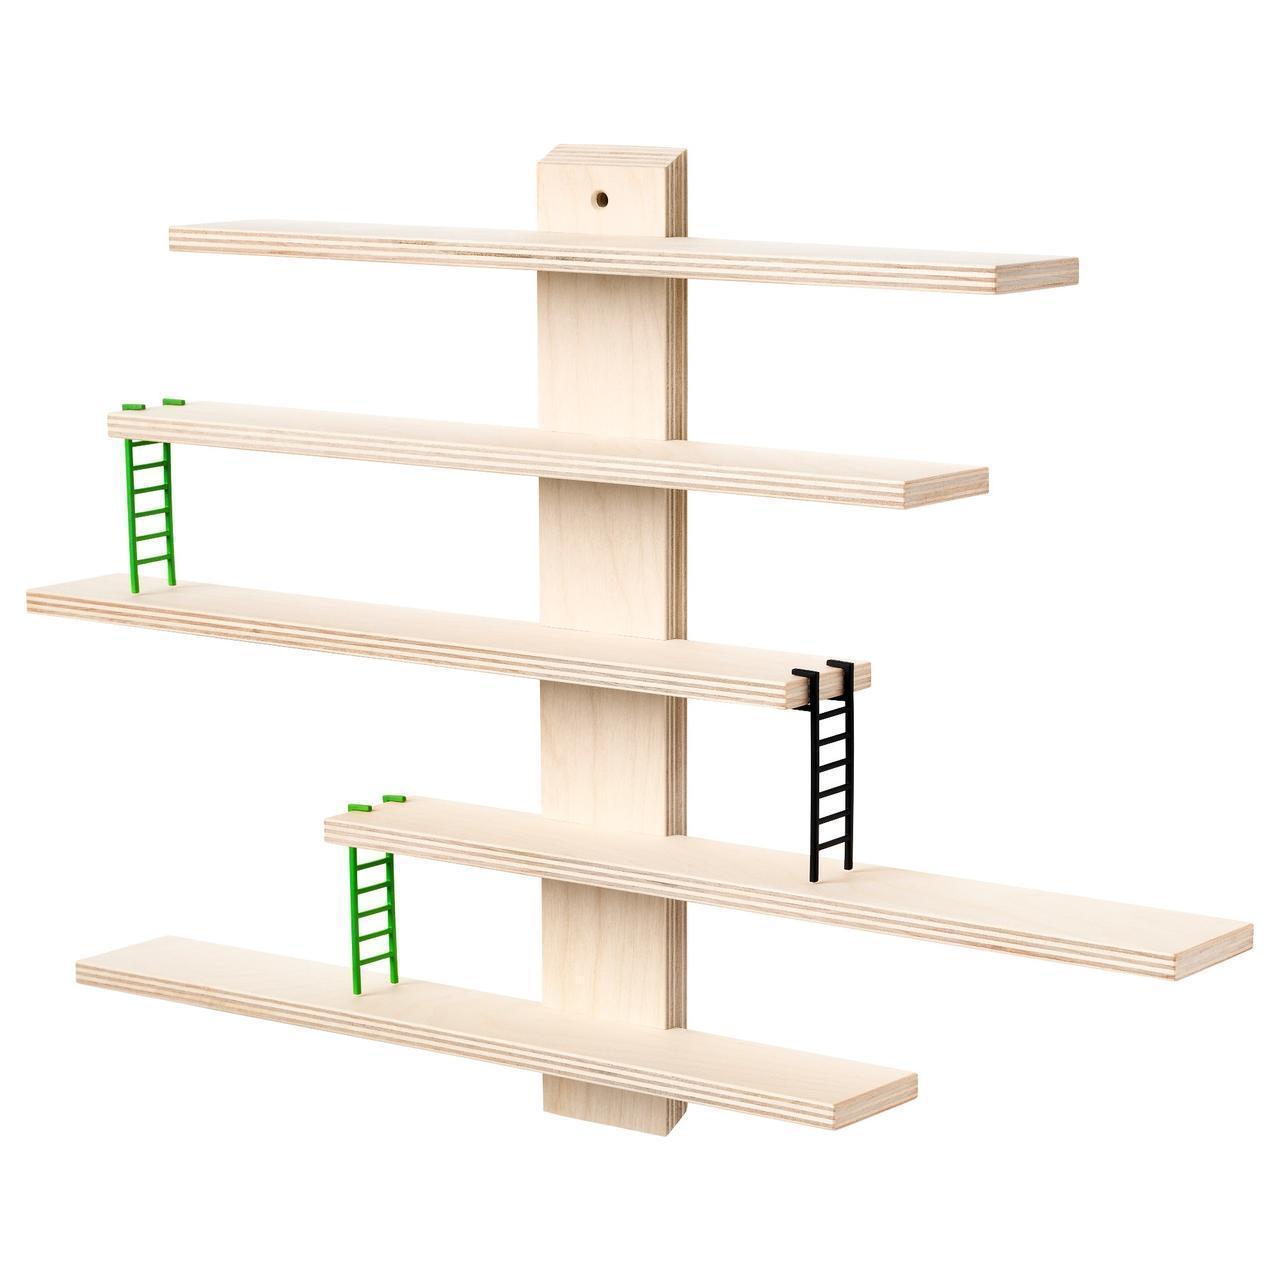 Полка IKEA LUSTIGT 37x37 см настенная 303.818.52